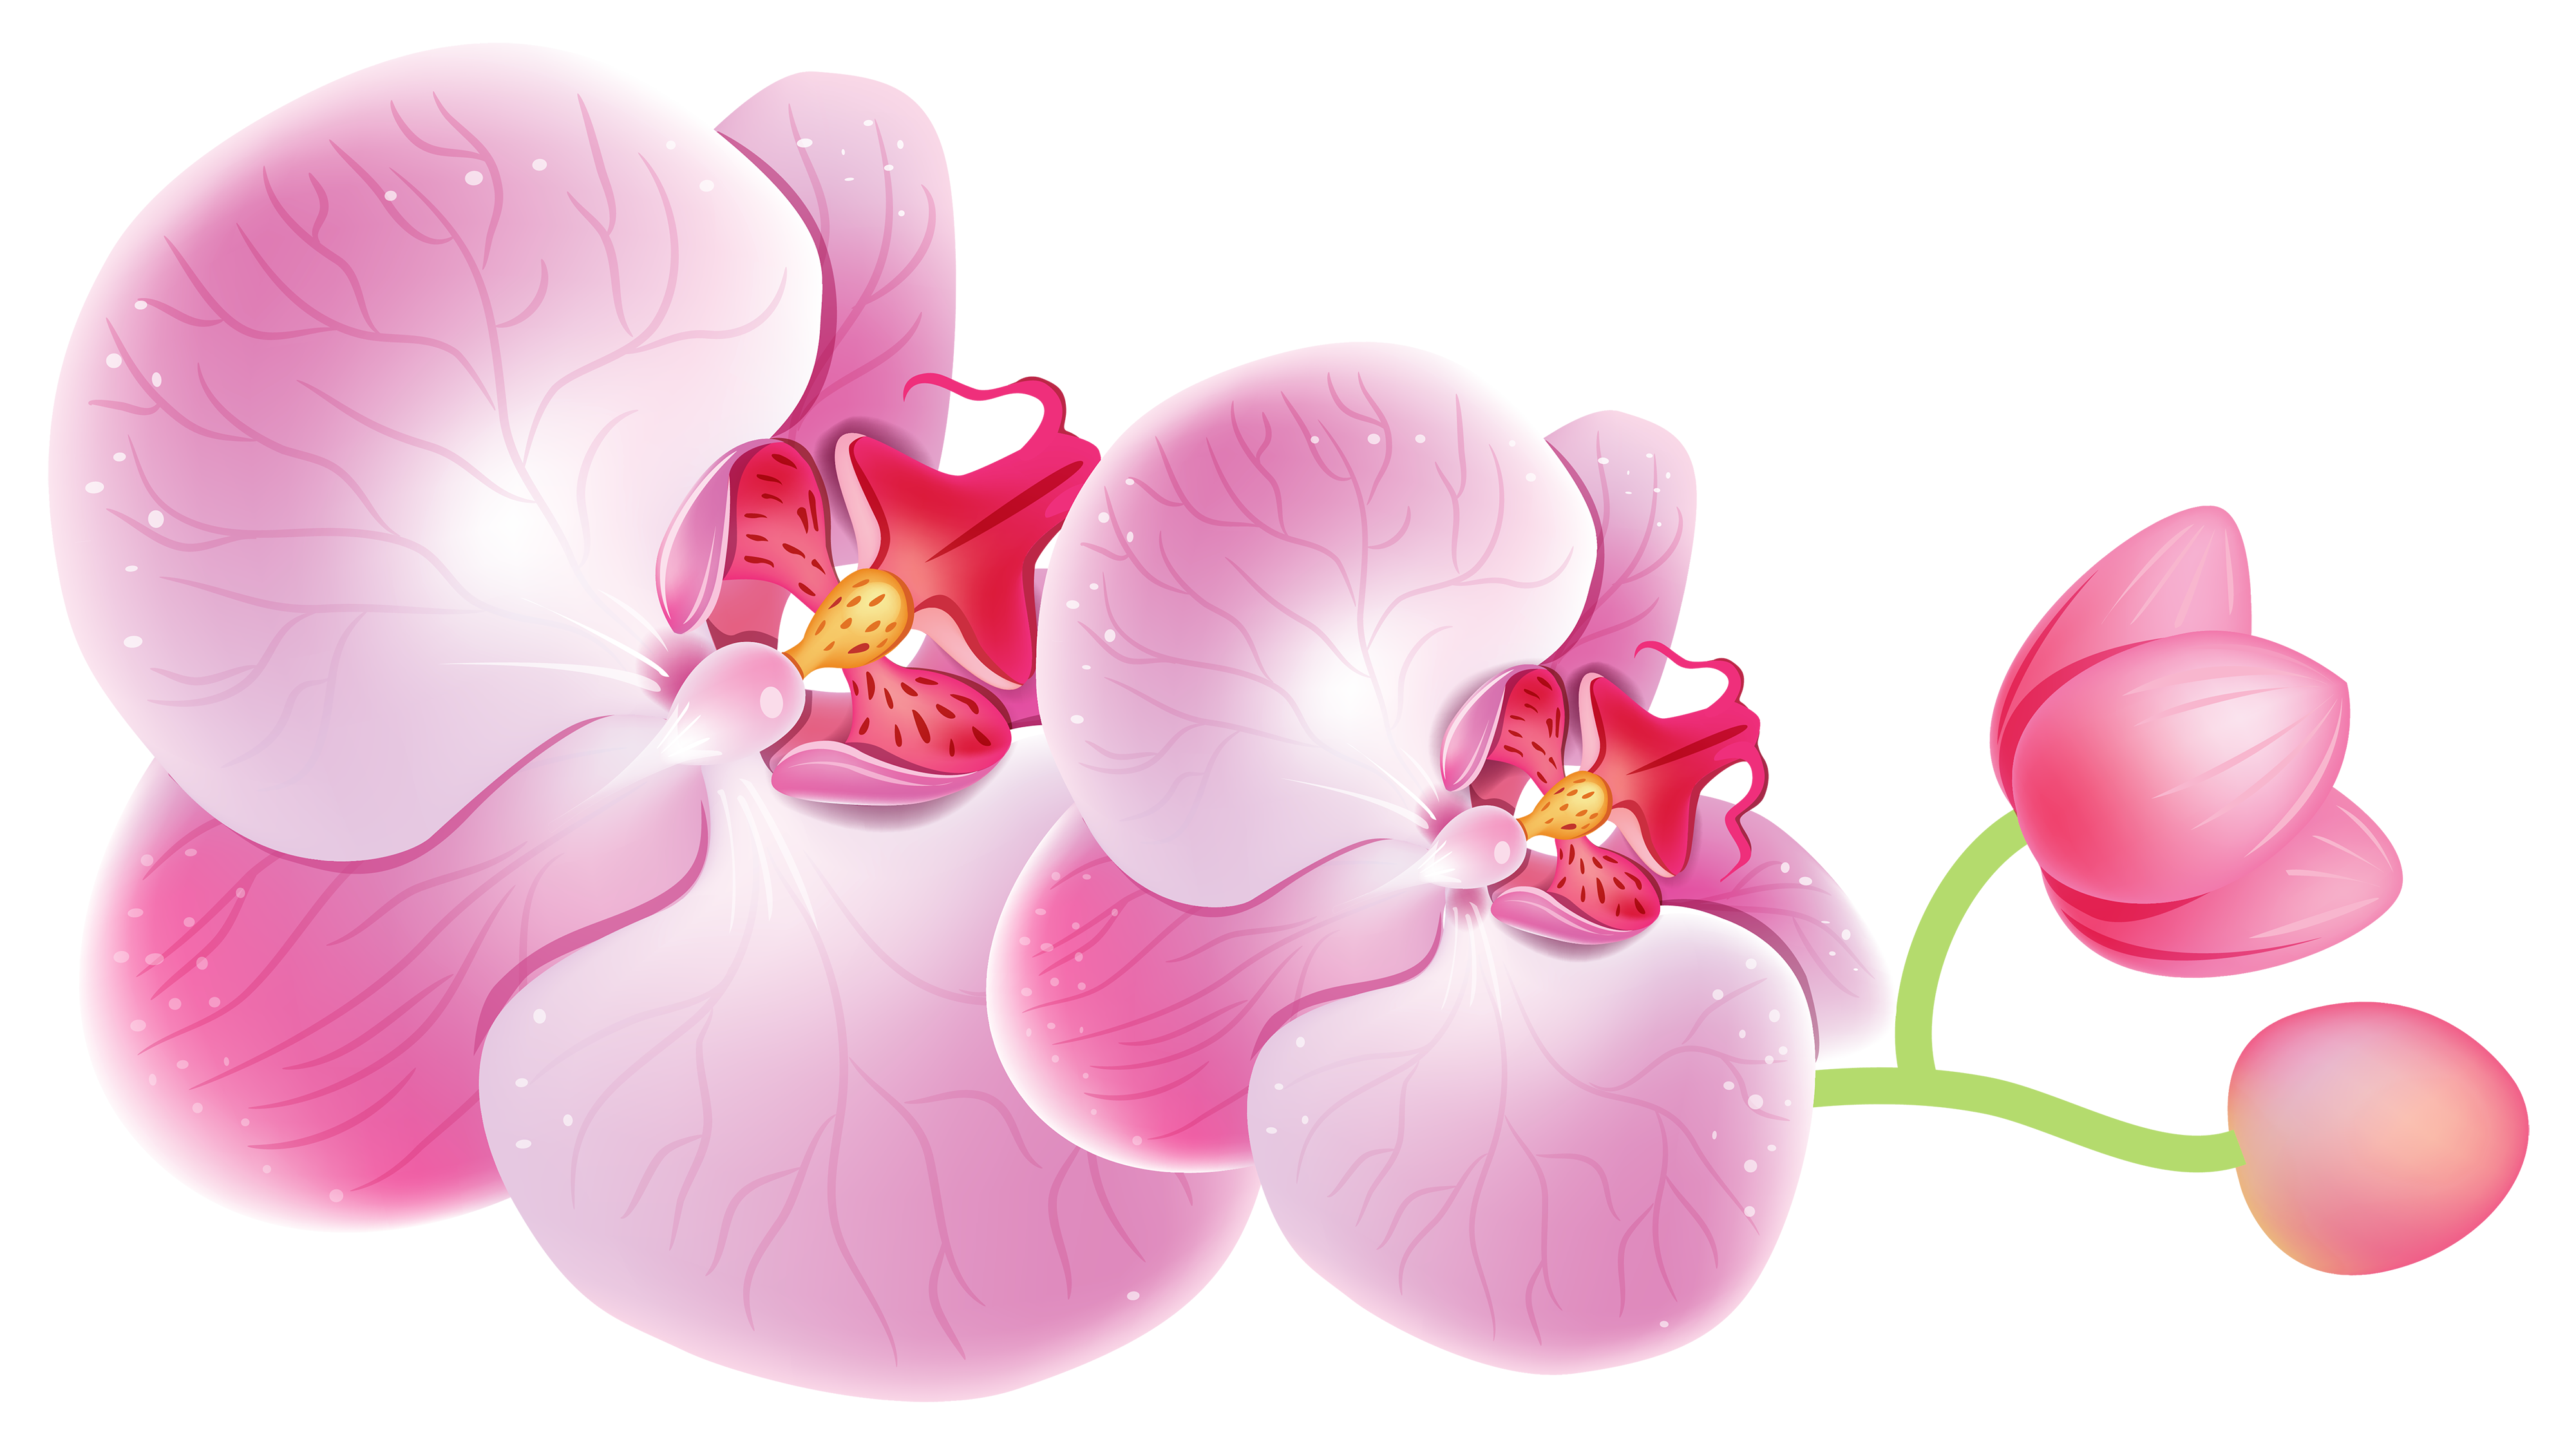 Orchids png best web. Orchid clipart